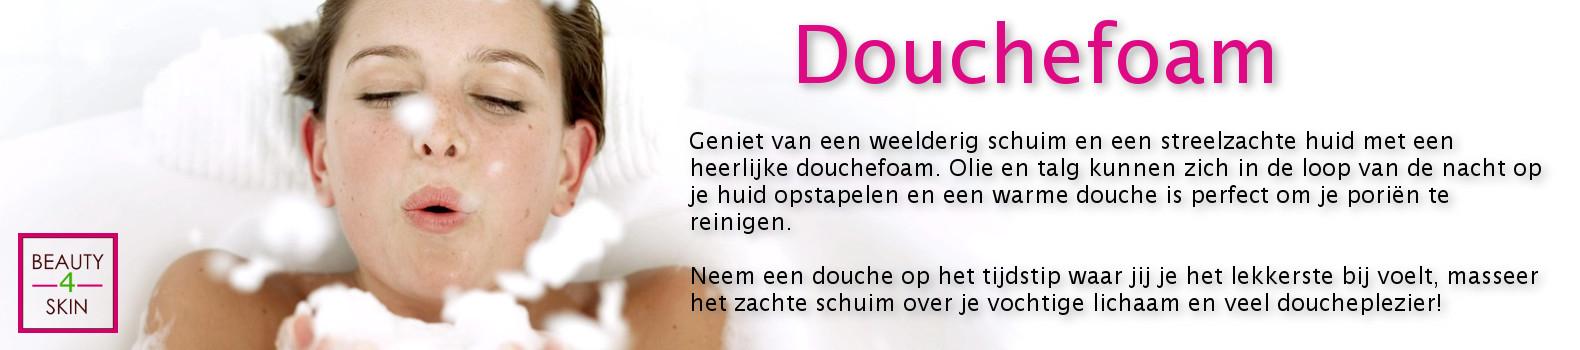 Douchefoam